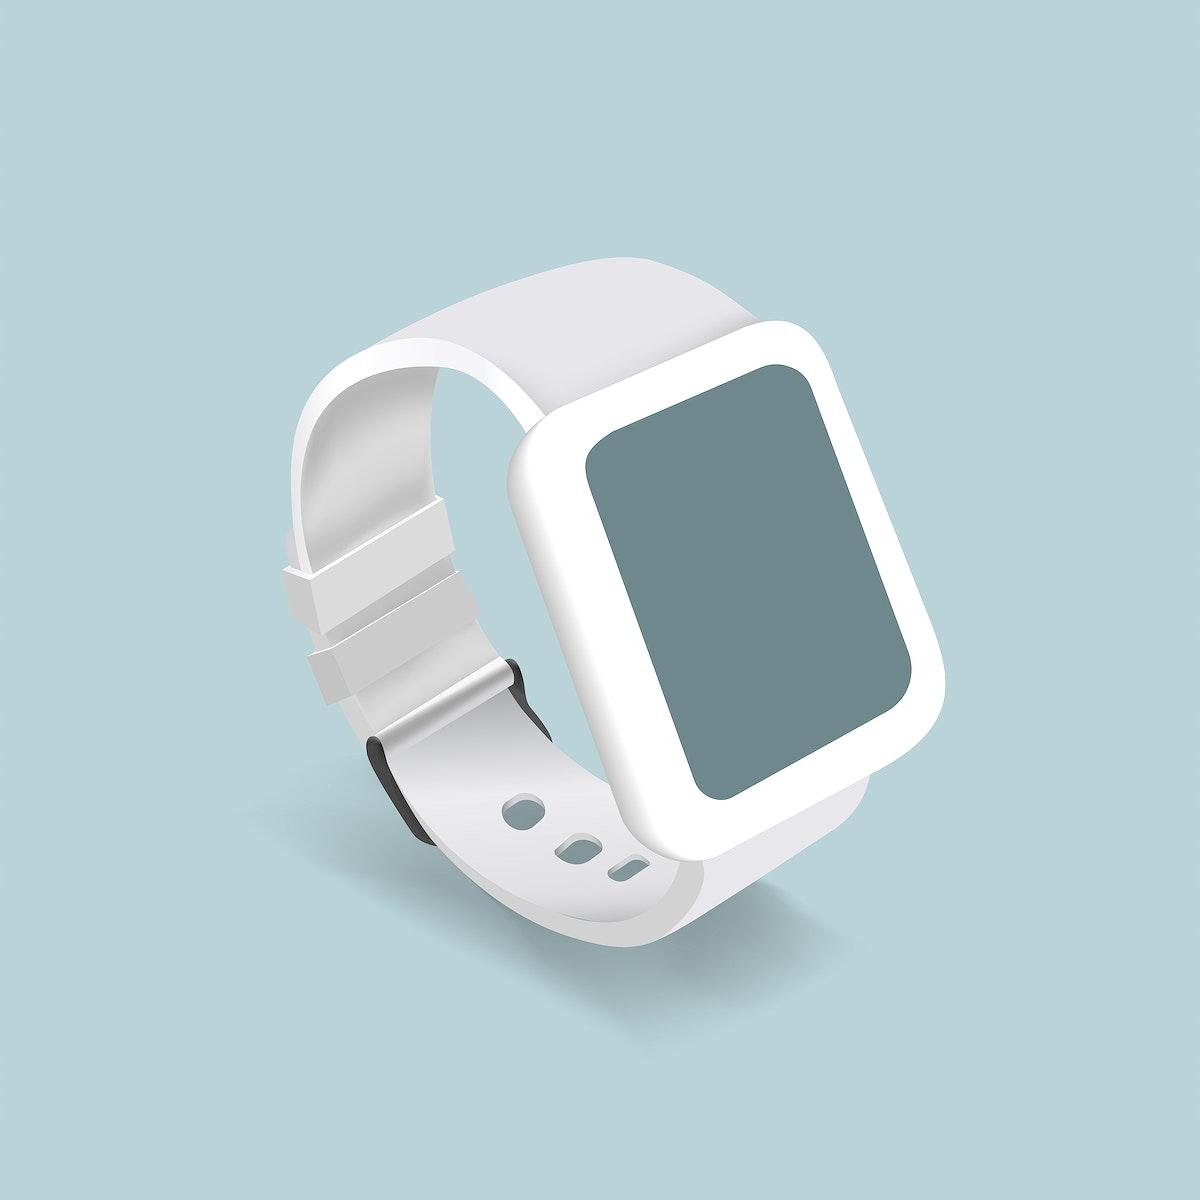 Vector of a smart watch